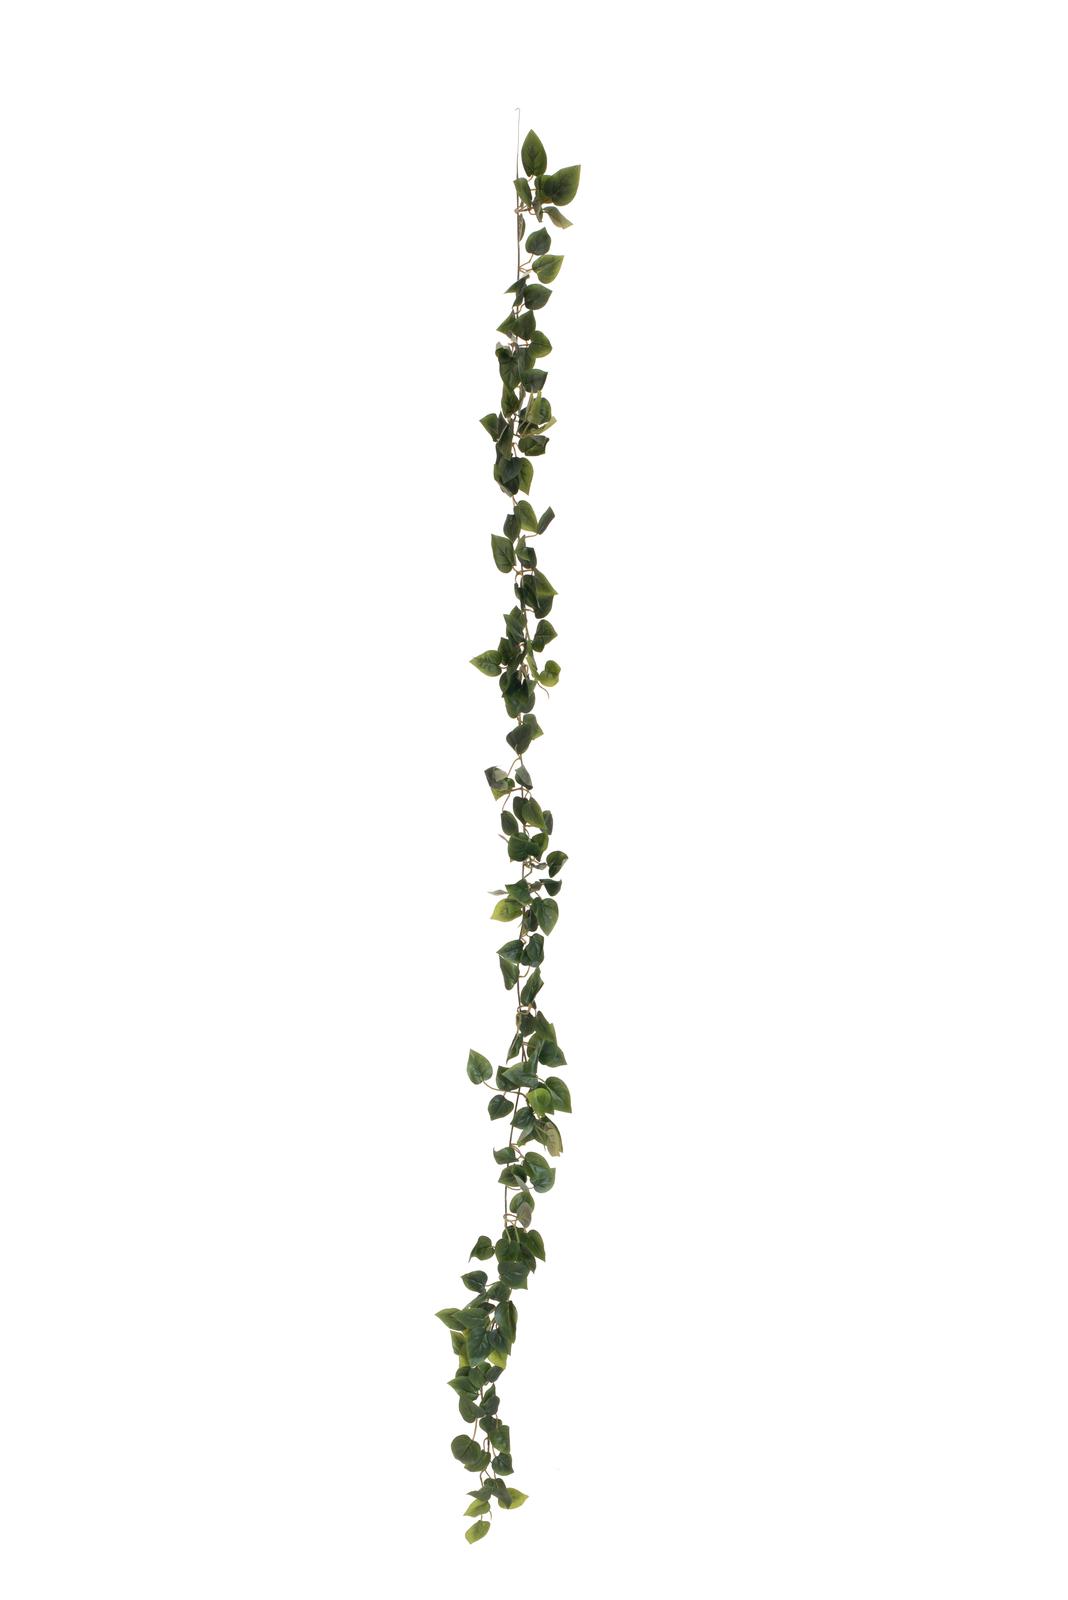 EUROPALMS Filodendro Ghirlanda Classica, 180cm